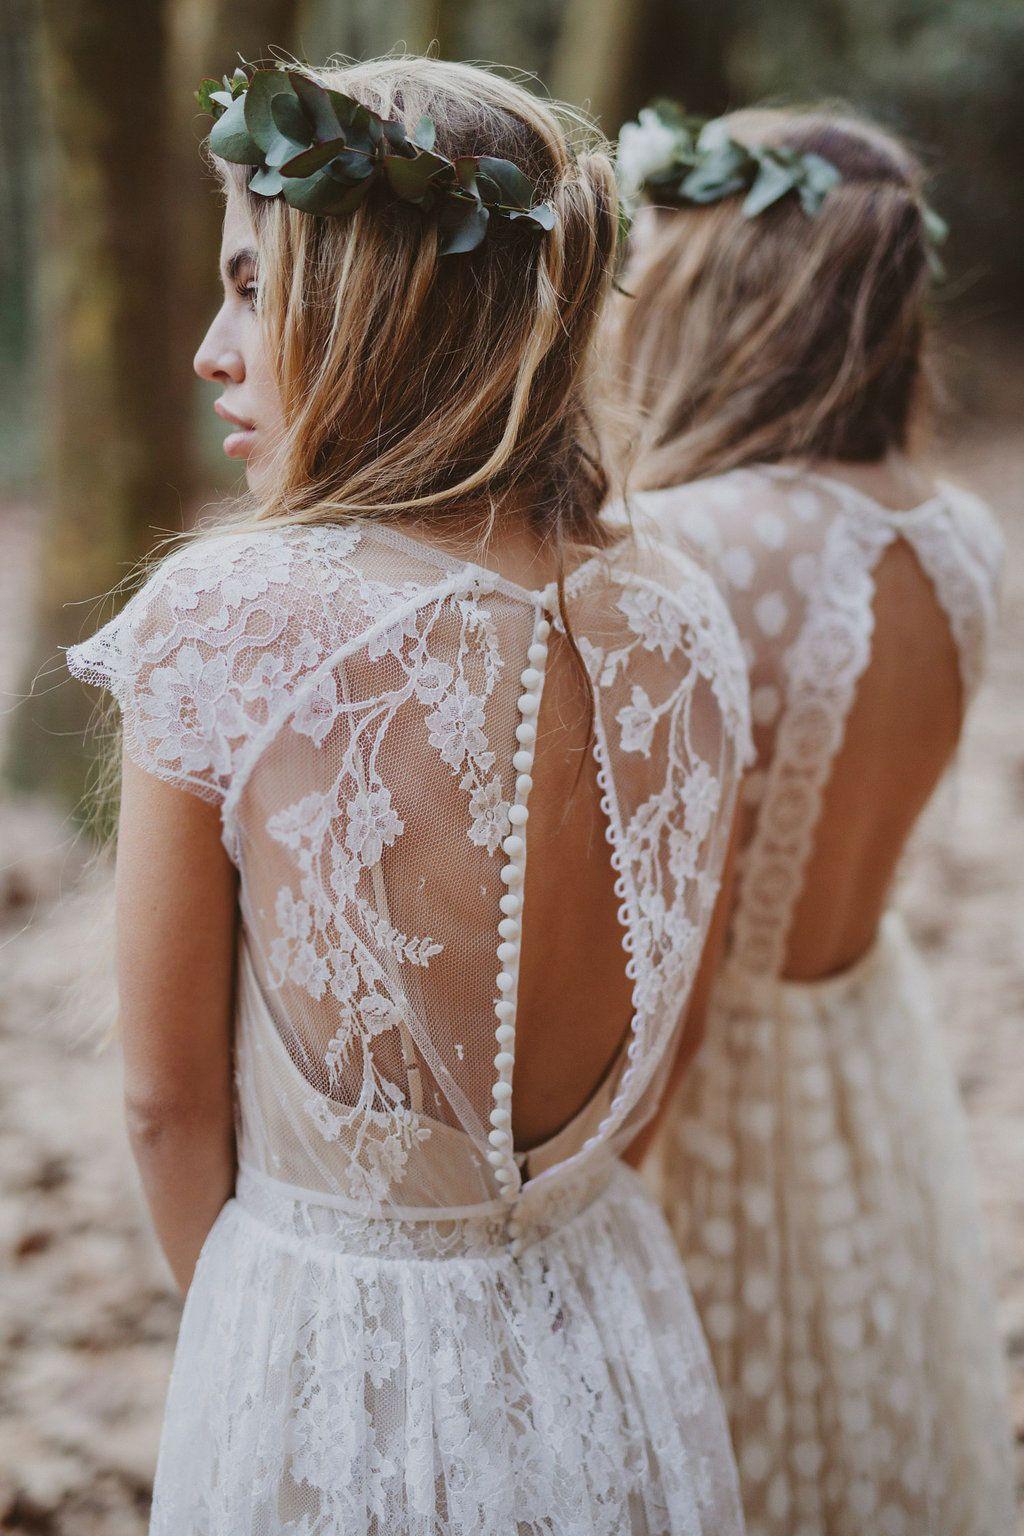 Terra mar immaclé novias estilo boho chic con vestido de encaje